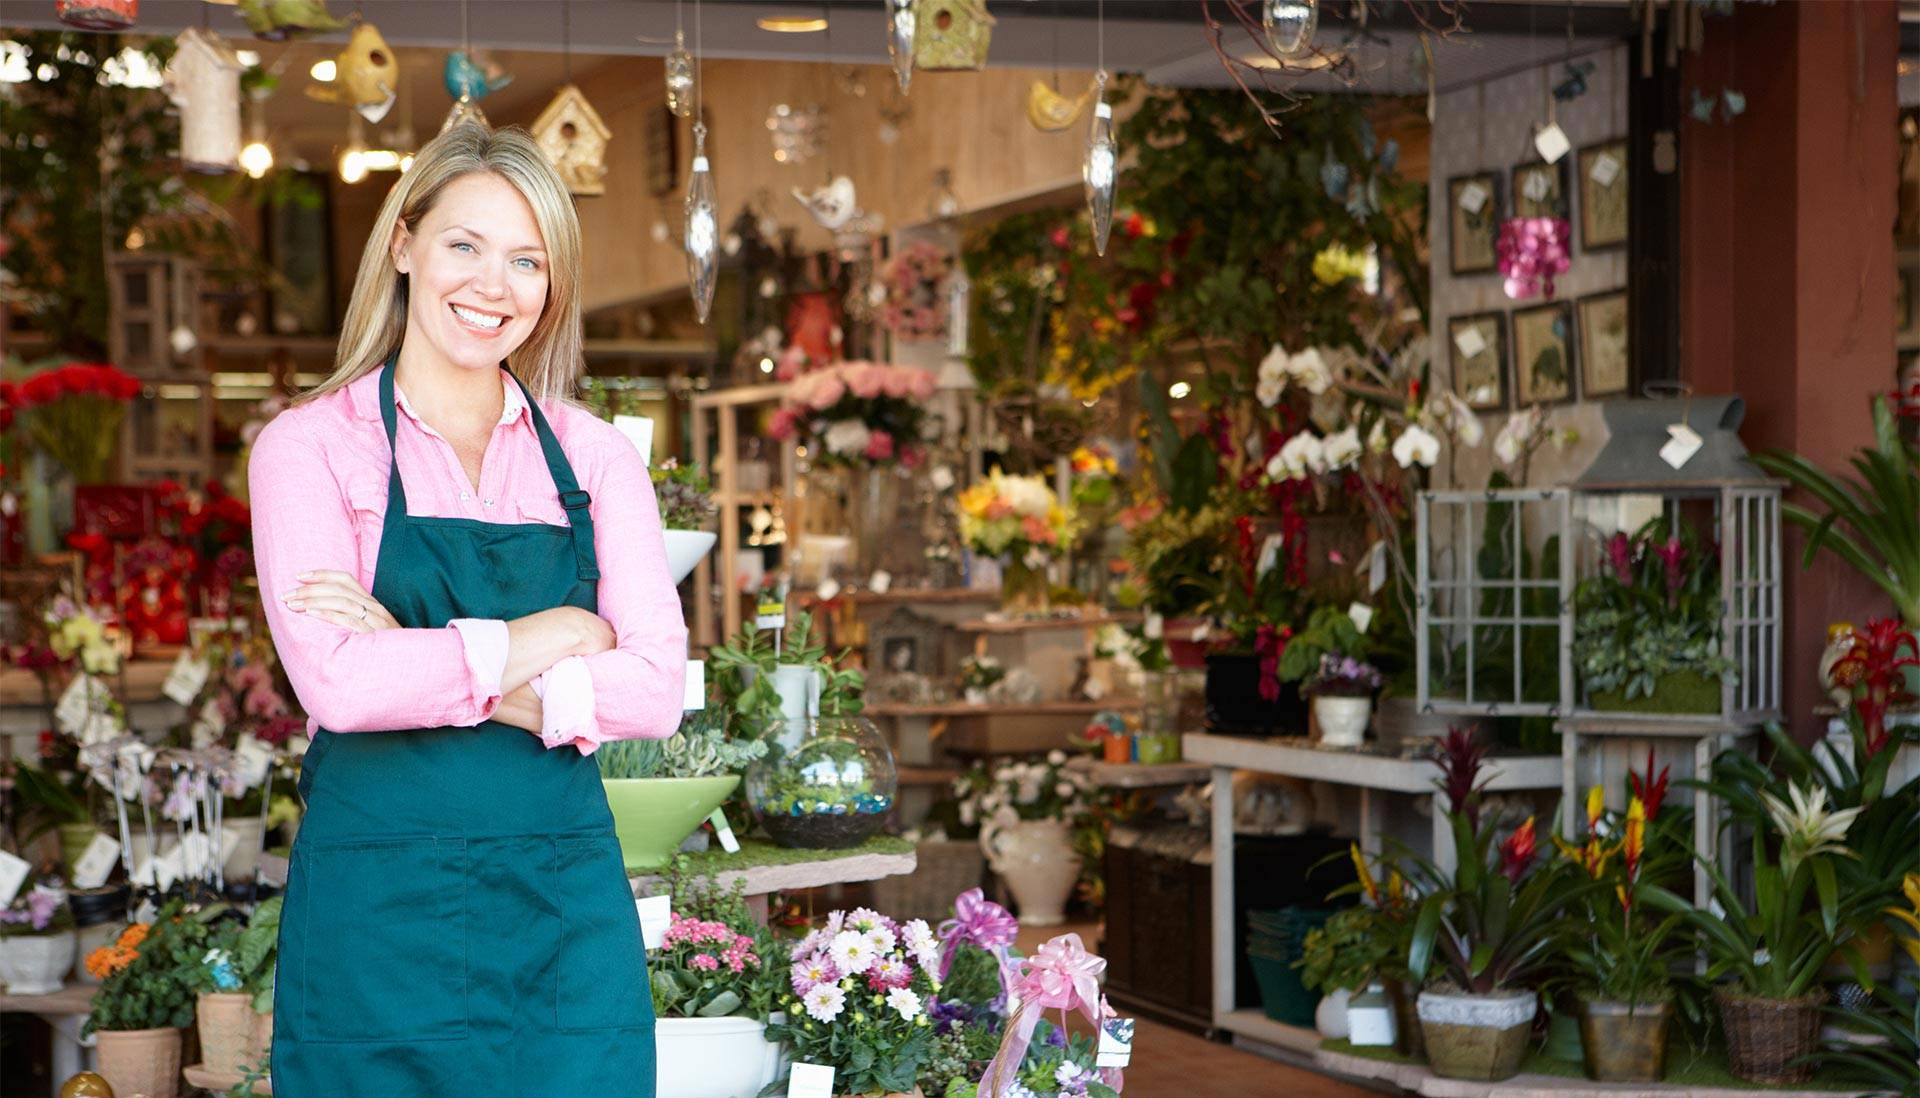 started-new-garden-center-business-home